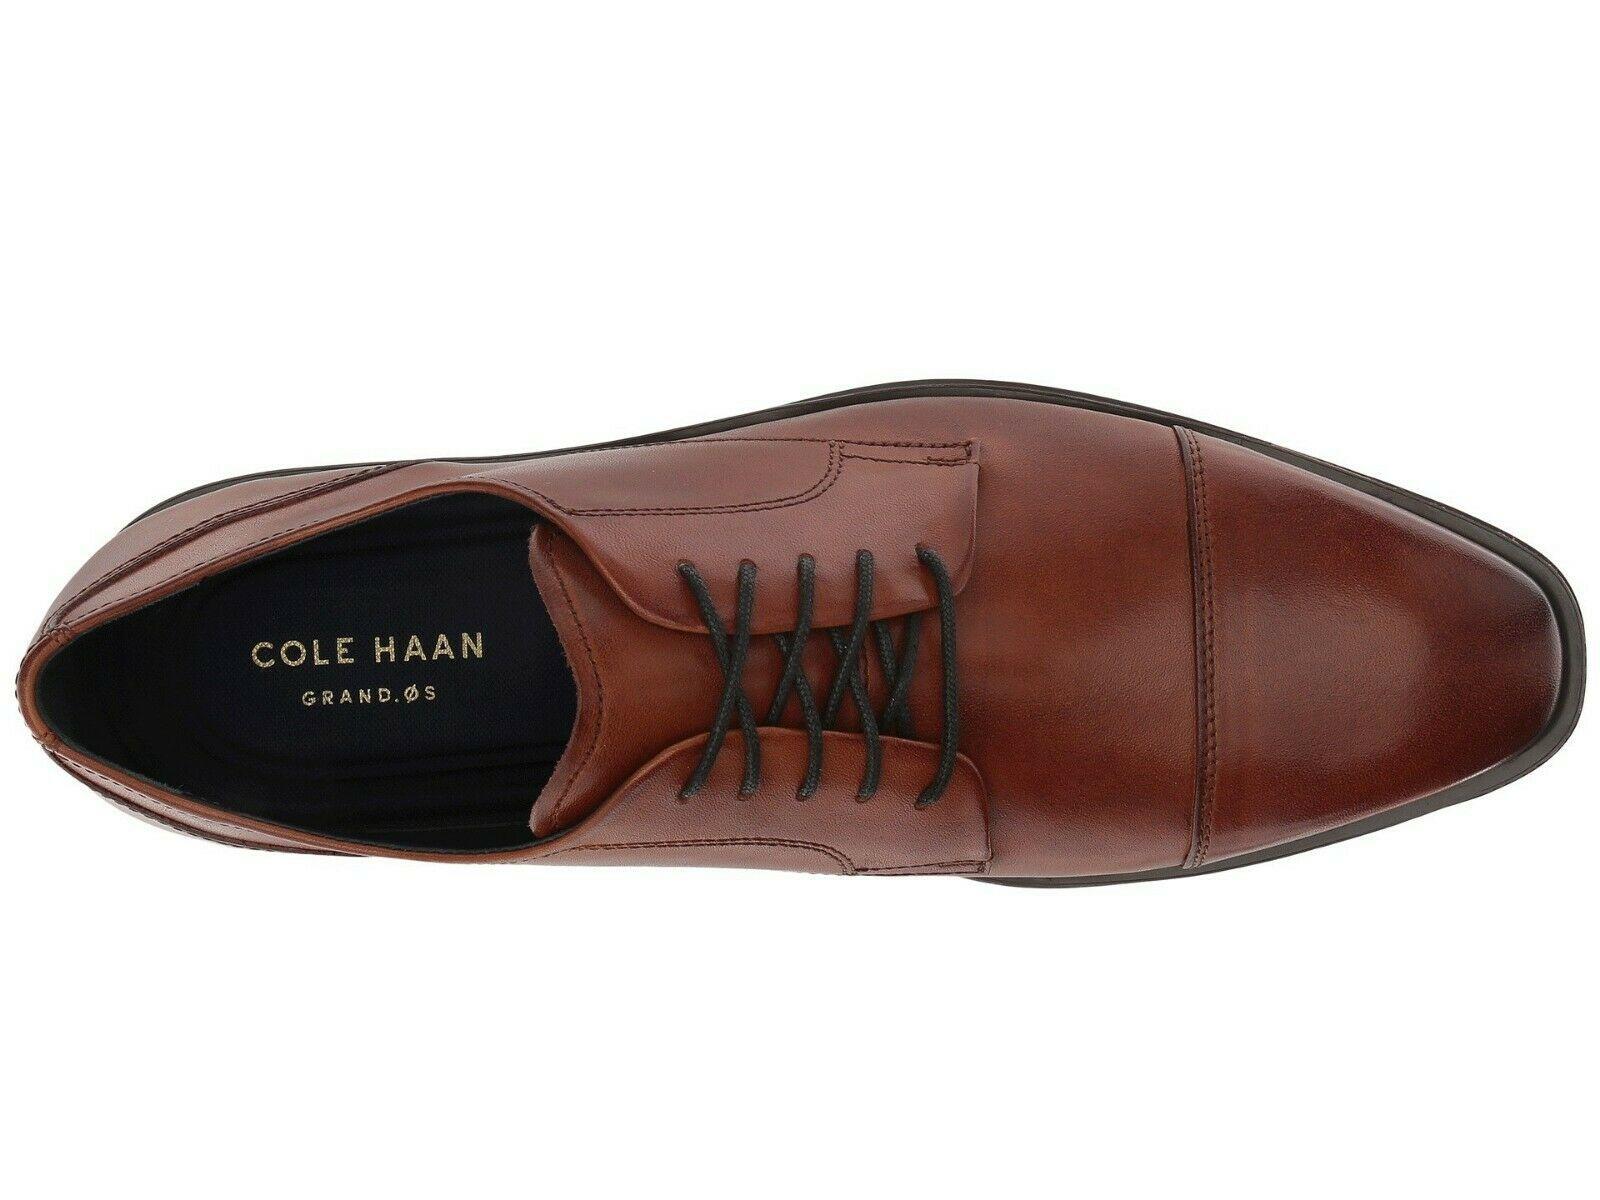 Cole Haan Dawes Grand Cap Toe Oxford